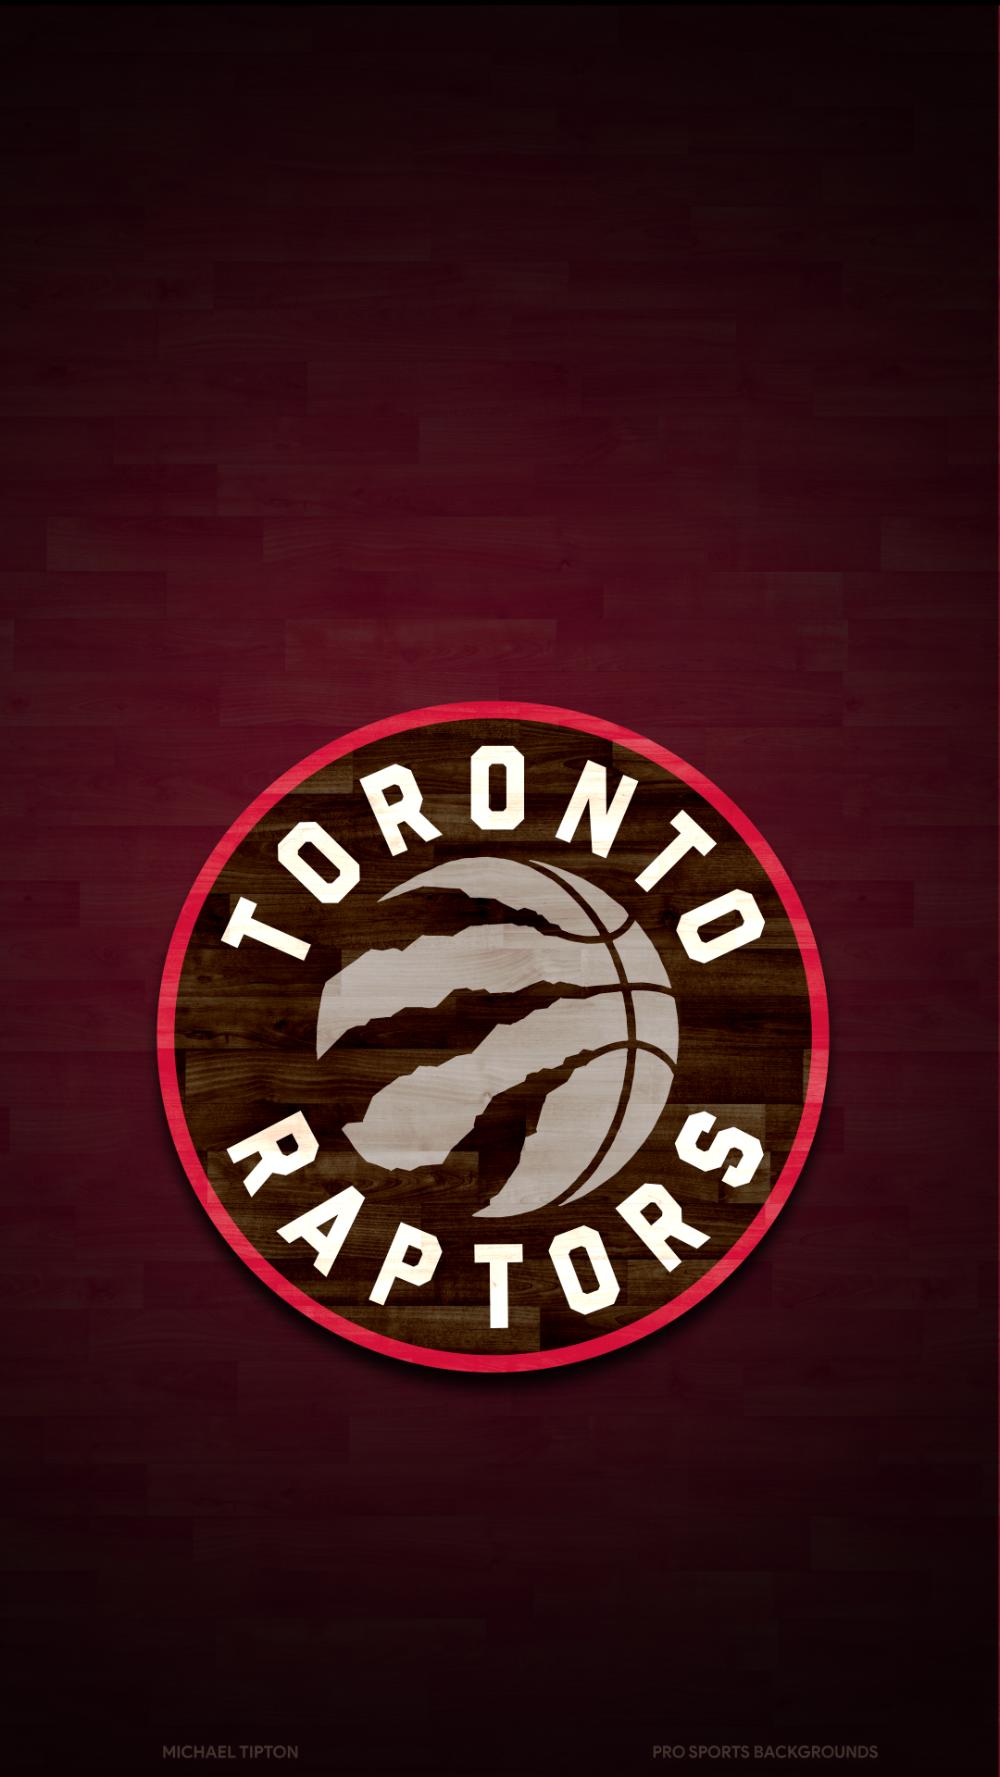 Toronto Raptors Wallpapers Papel De Parede Para Telefone Basquete